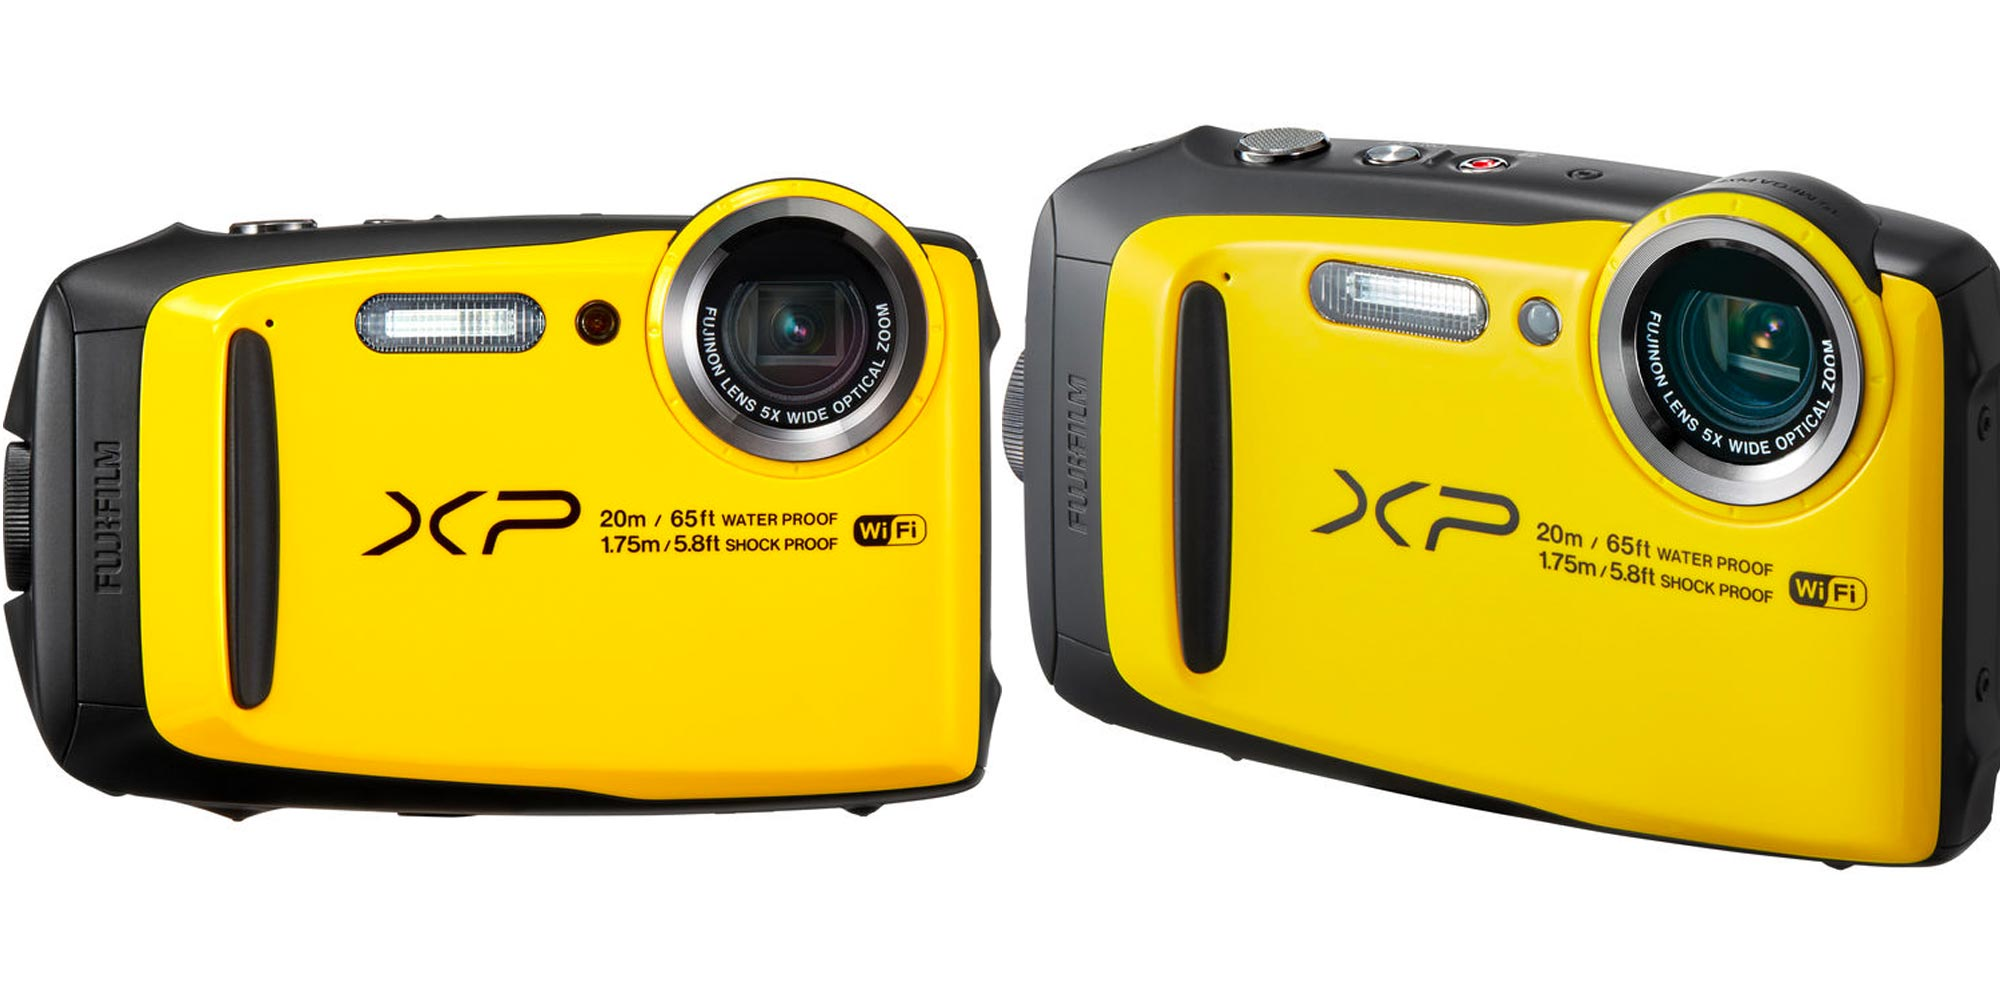 Record video & take photos underwater w/ Fujifilm's digital camera for $99 shipped